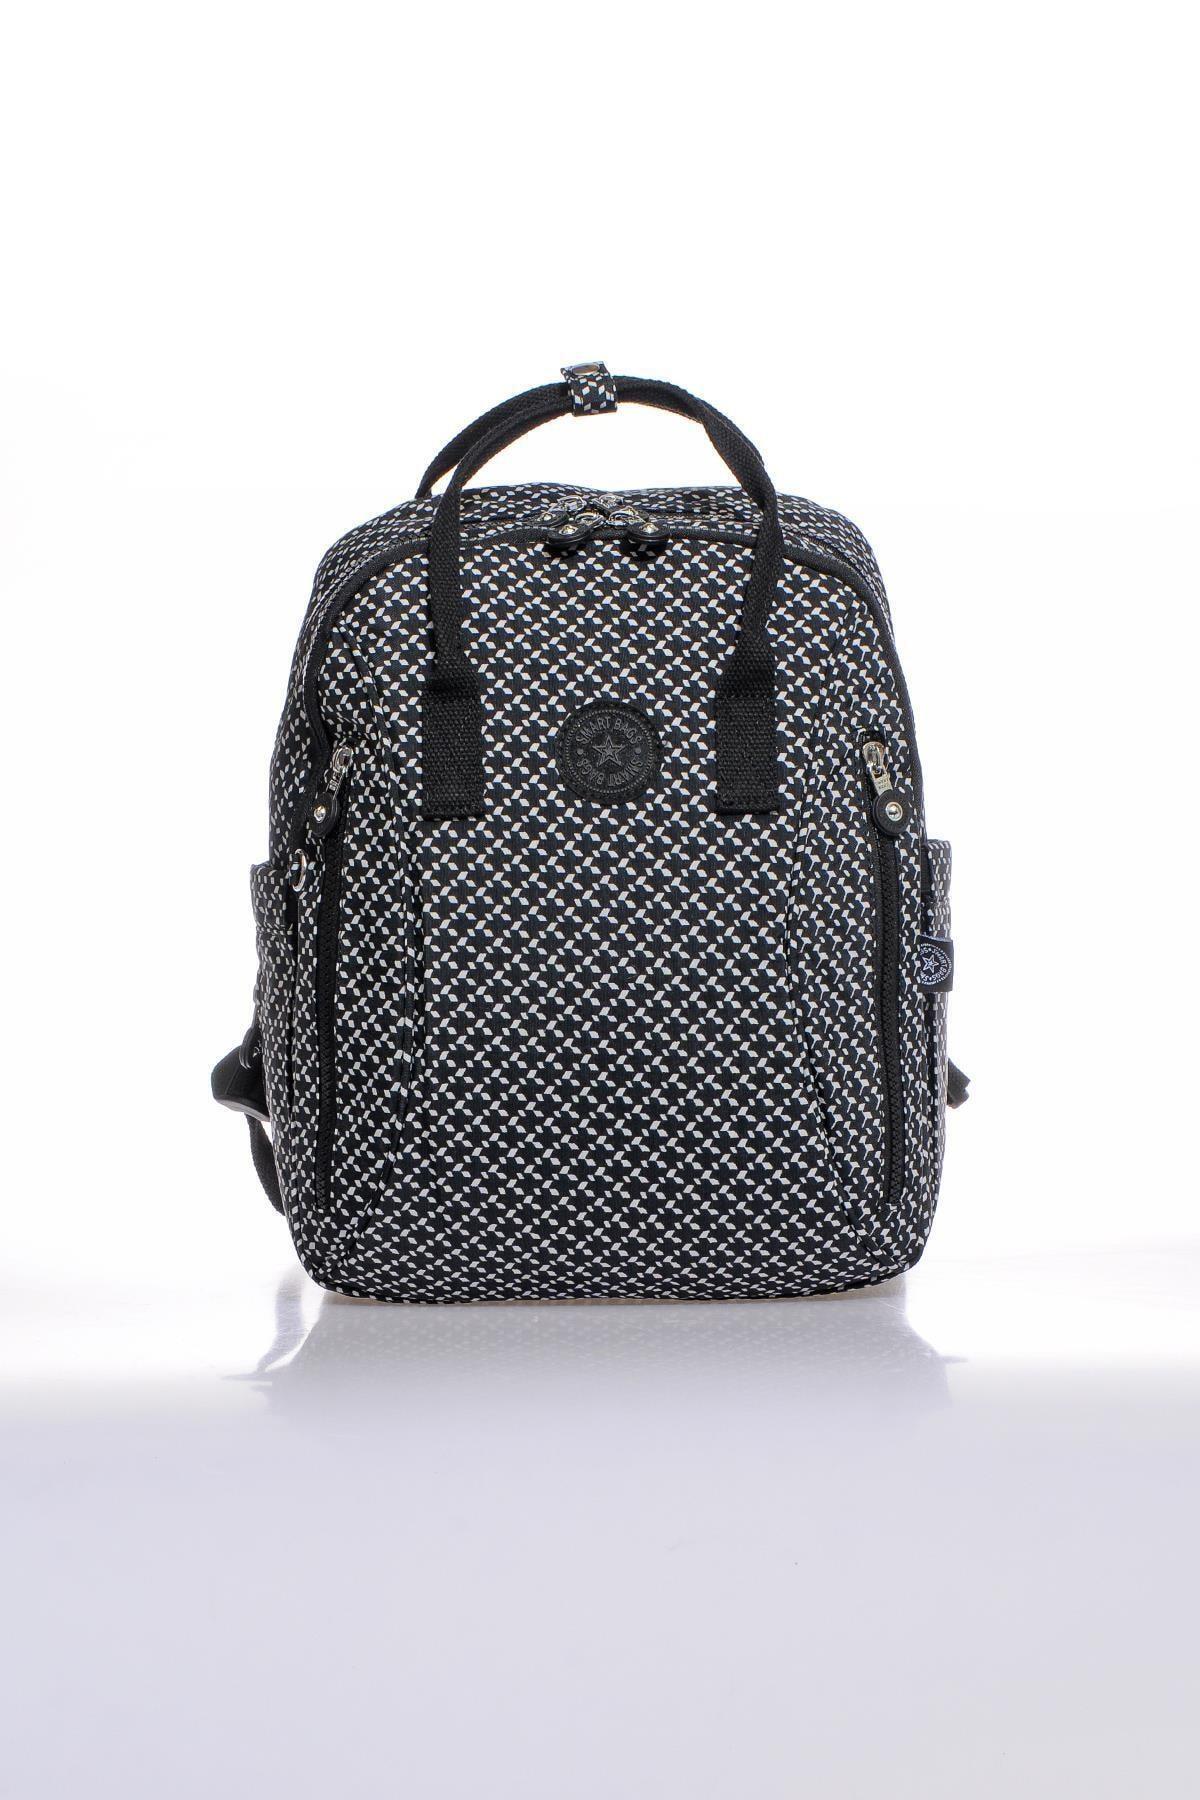 SMART BAGS Smb1220-0127 Siyah/beyaz Kadın Sırt Çantası 1